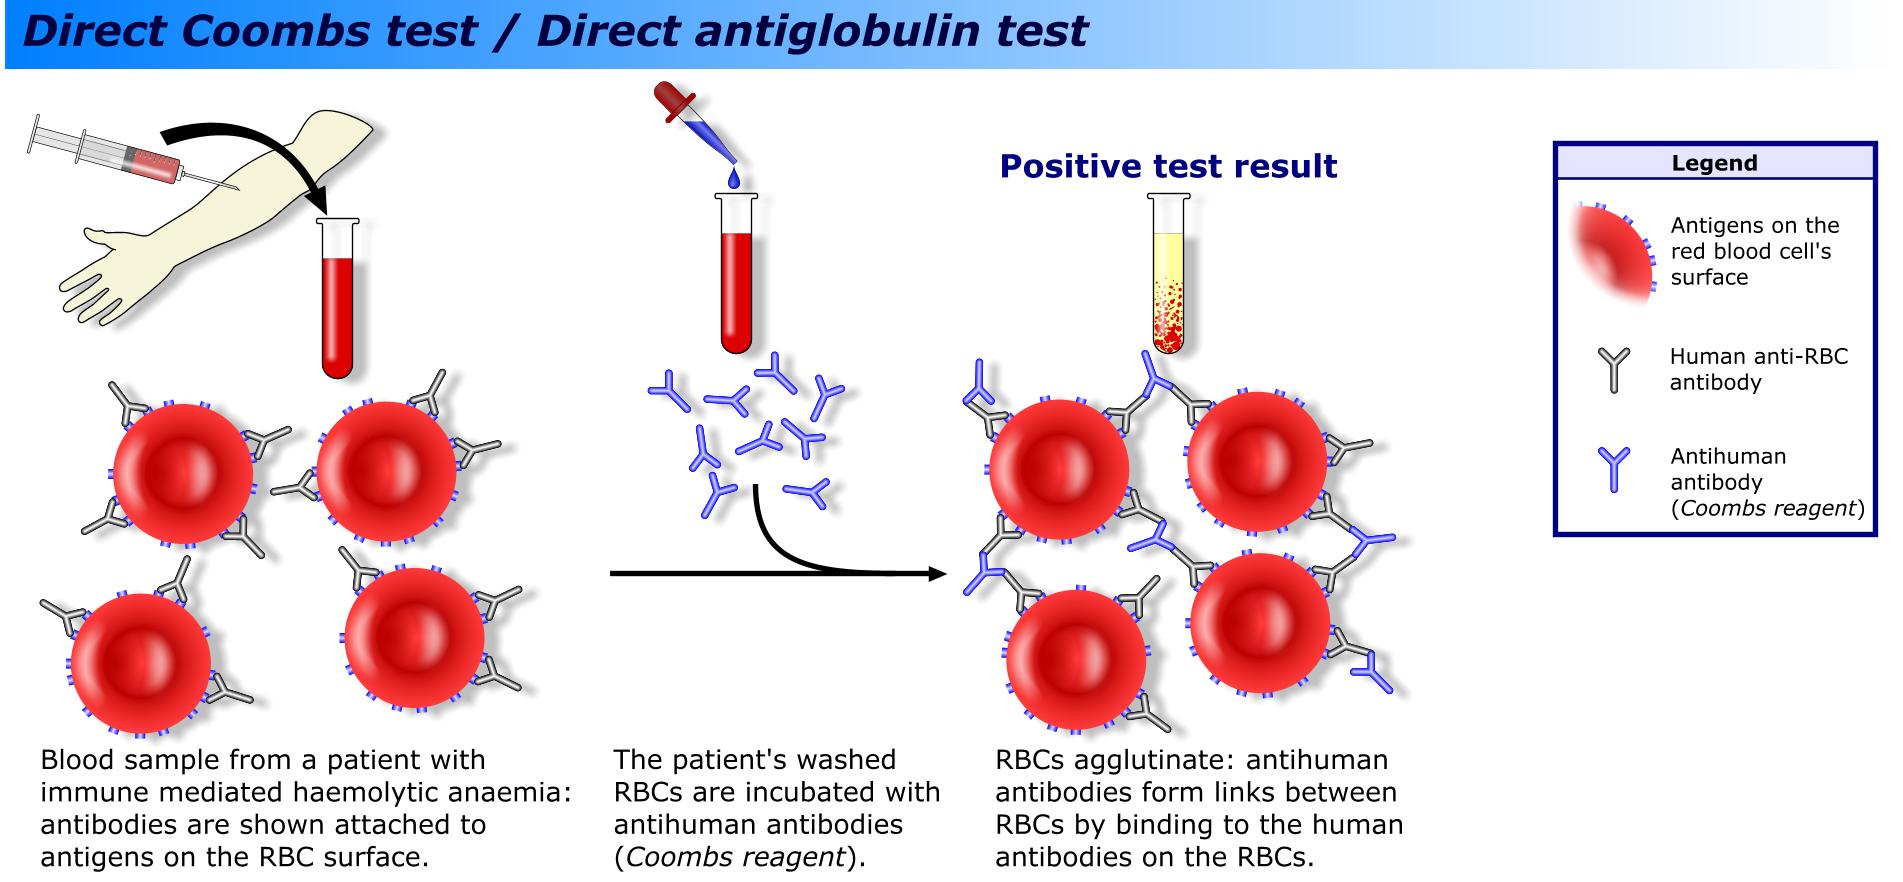 Директен антиглобулинов тест на Кумбс (Coombs)